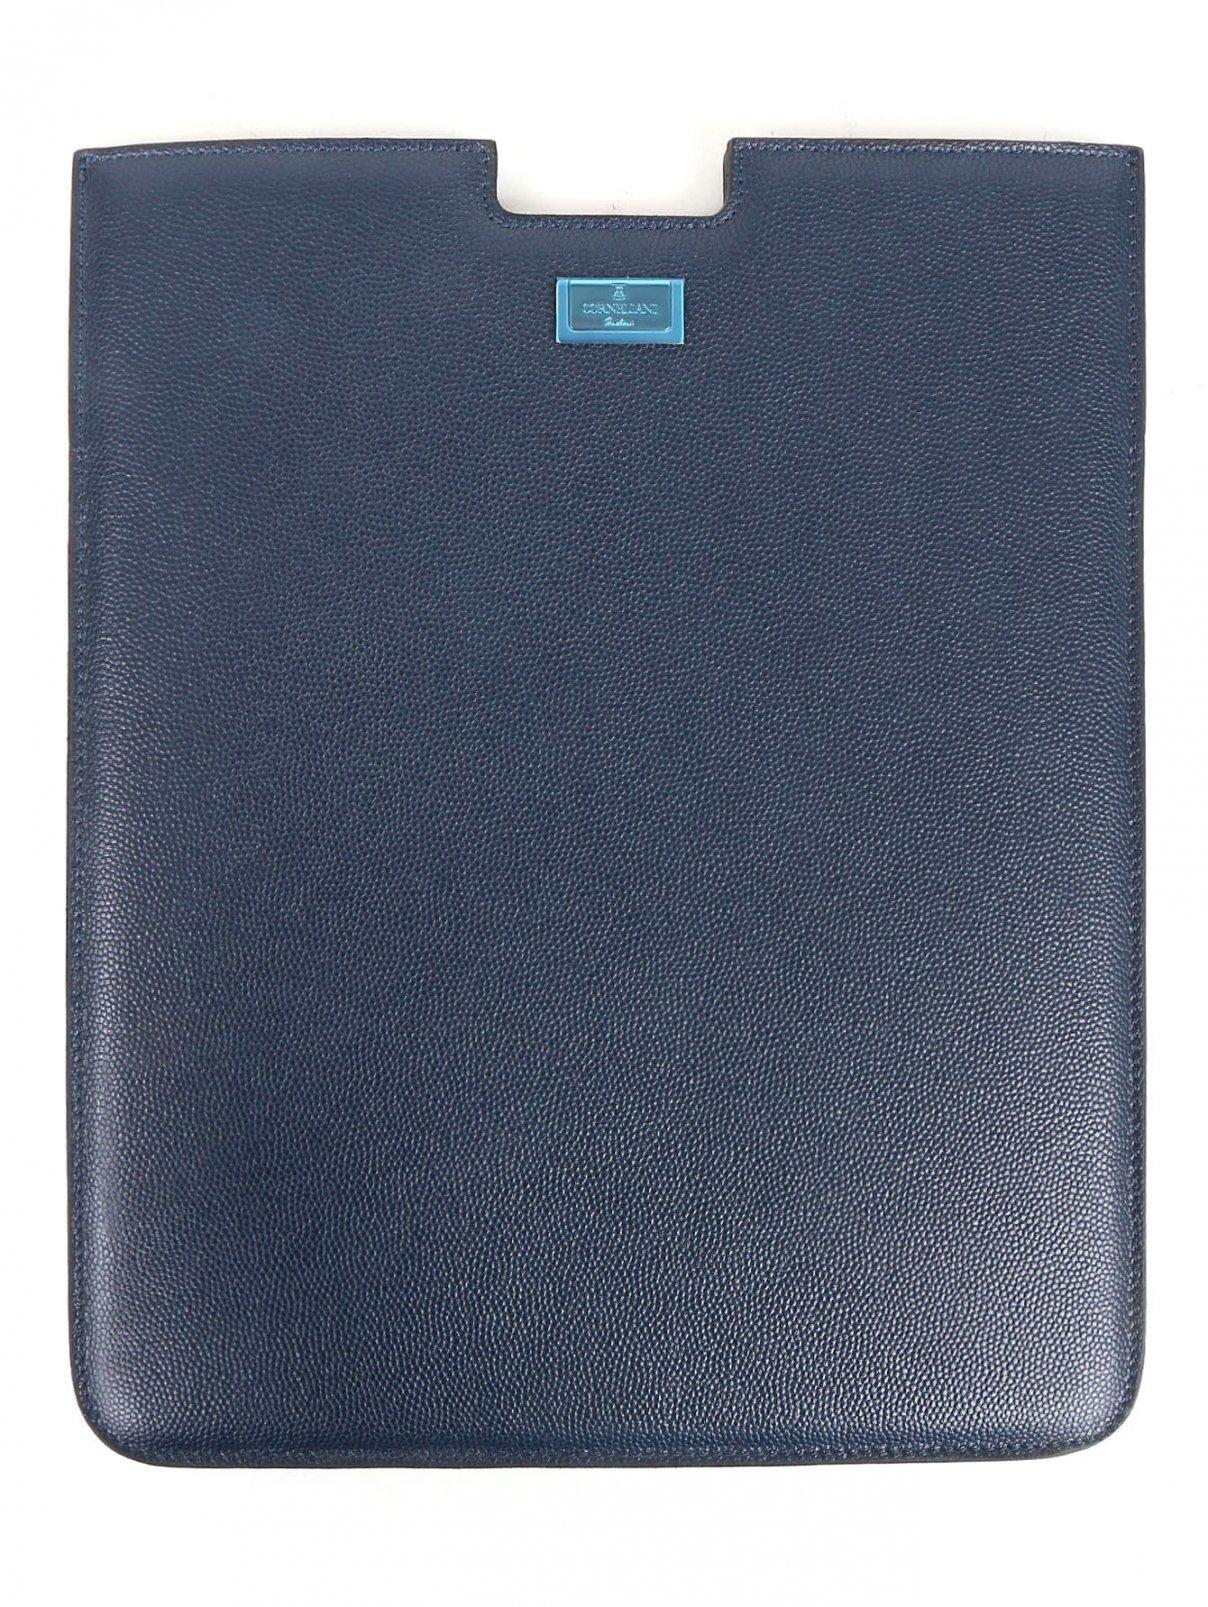 Чехол для Ipad из фактурной кожи Corneliani  –  Общий вид  – Цвет:  Синий